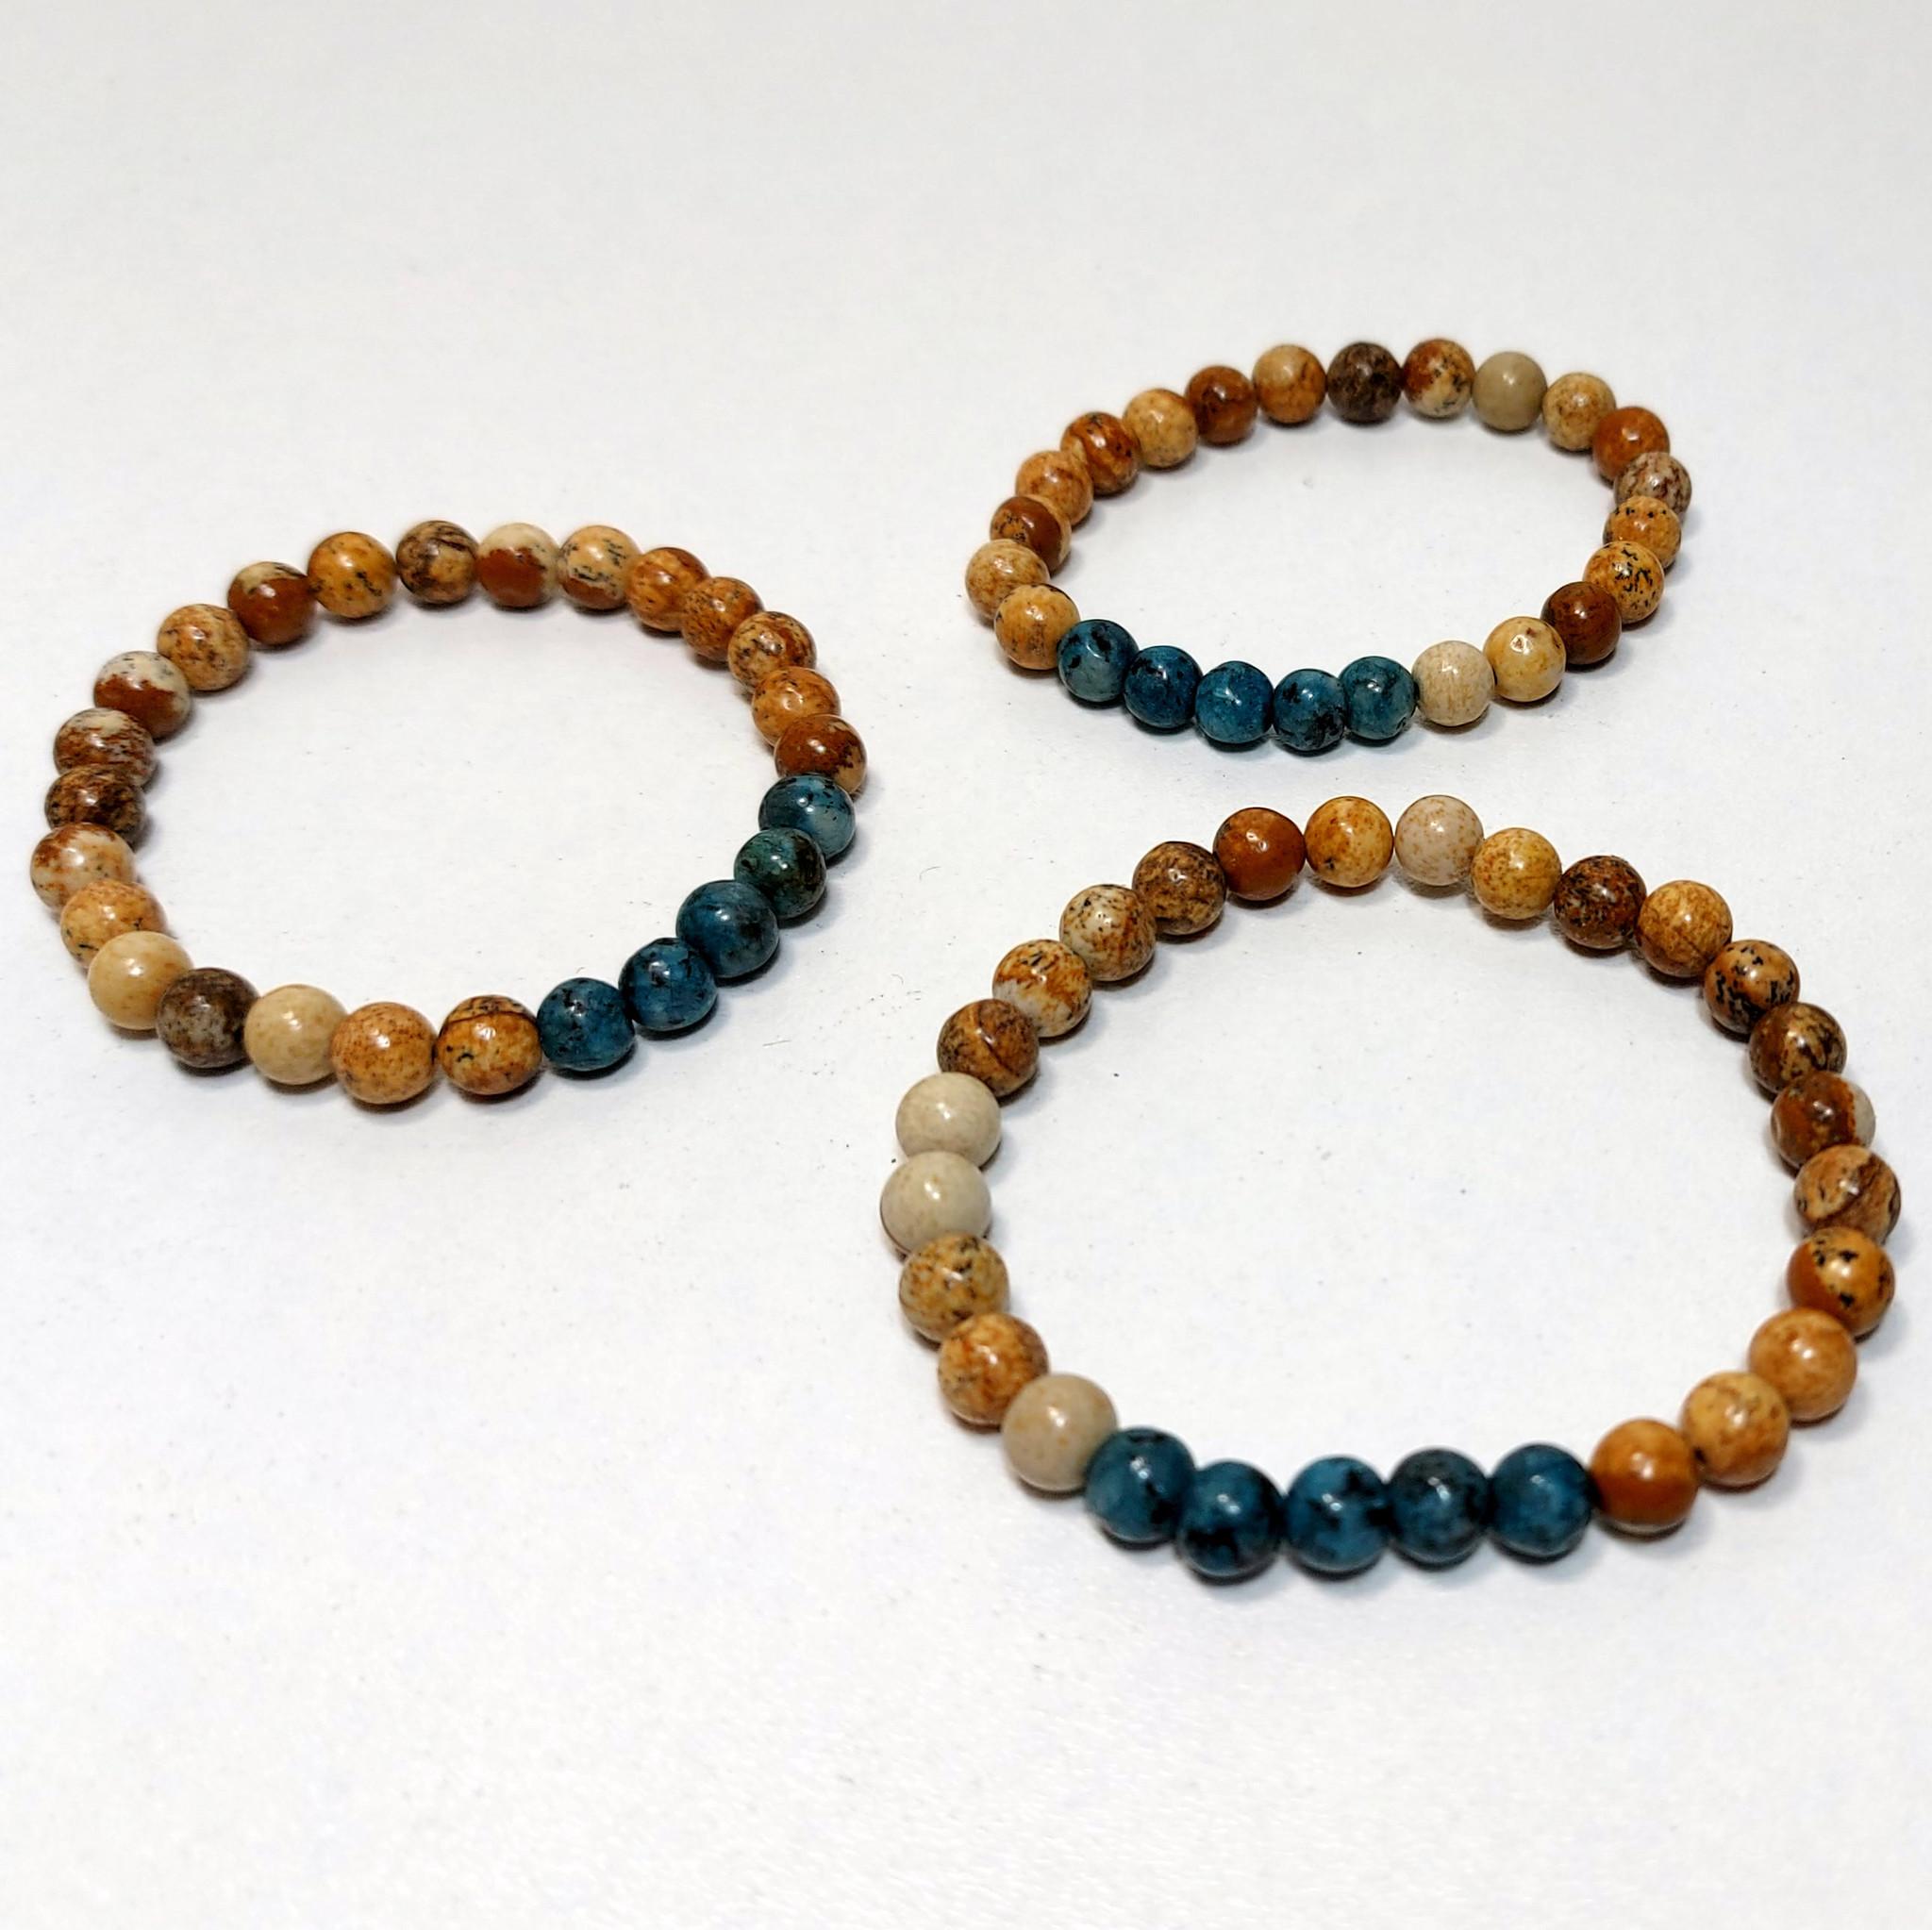 Sazou Jewels Armband Boys  - Natural Stones Tan Brown & Petrol Blue marmer